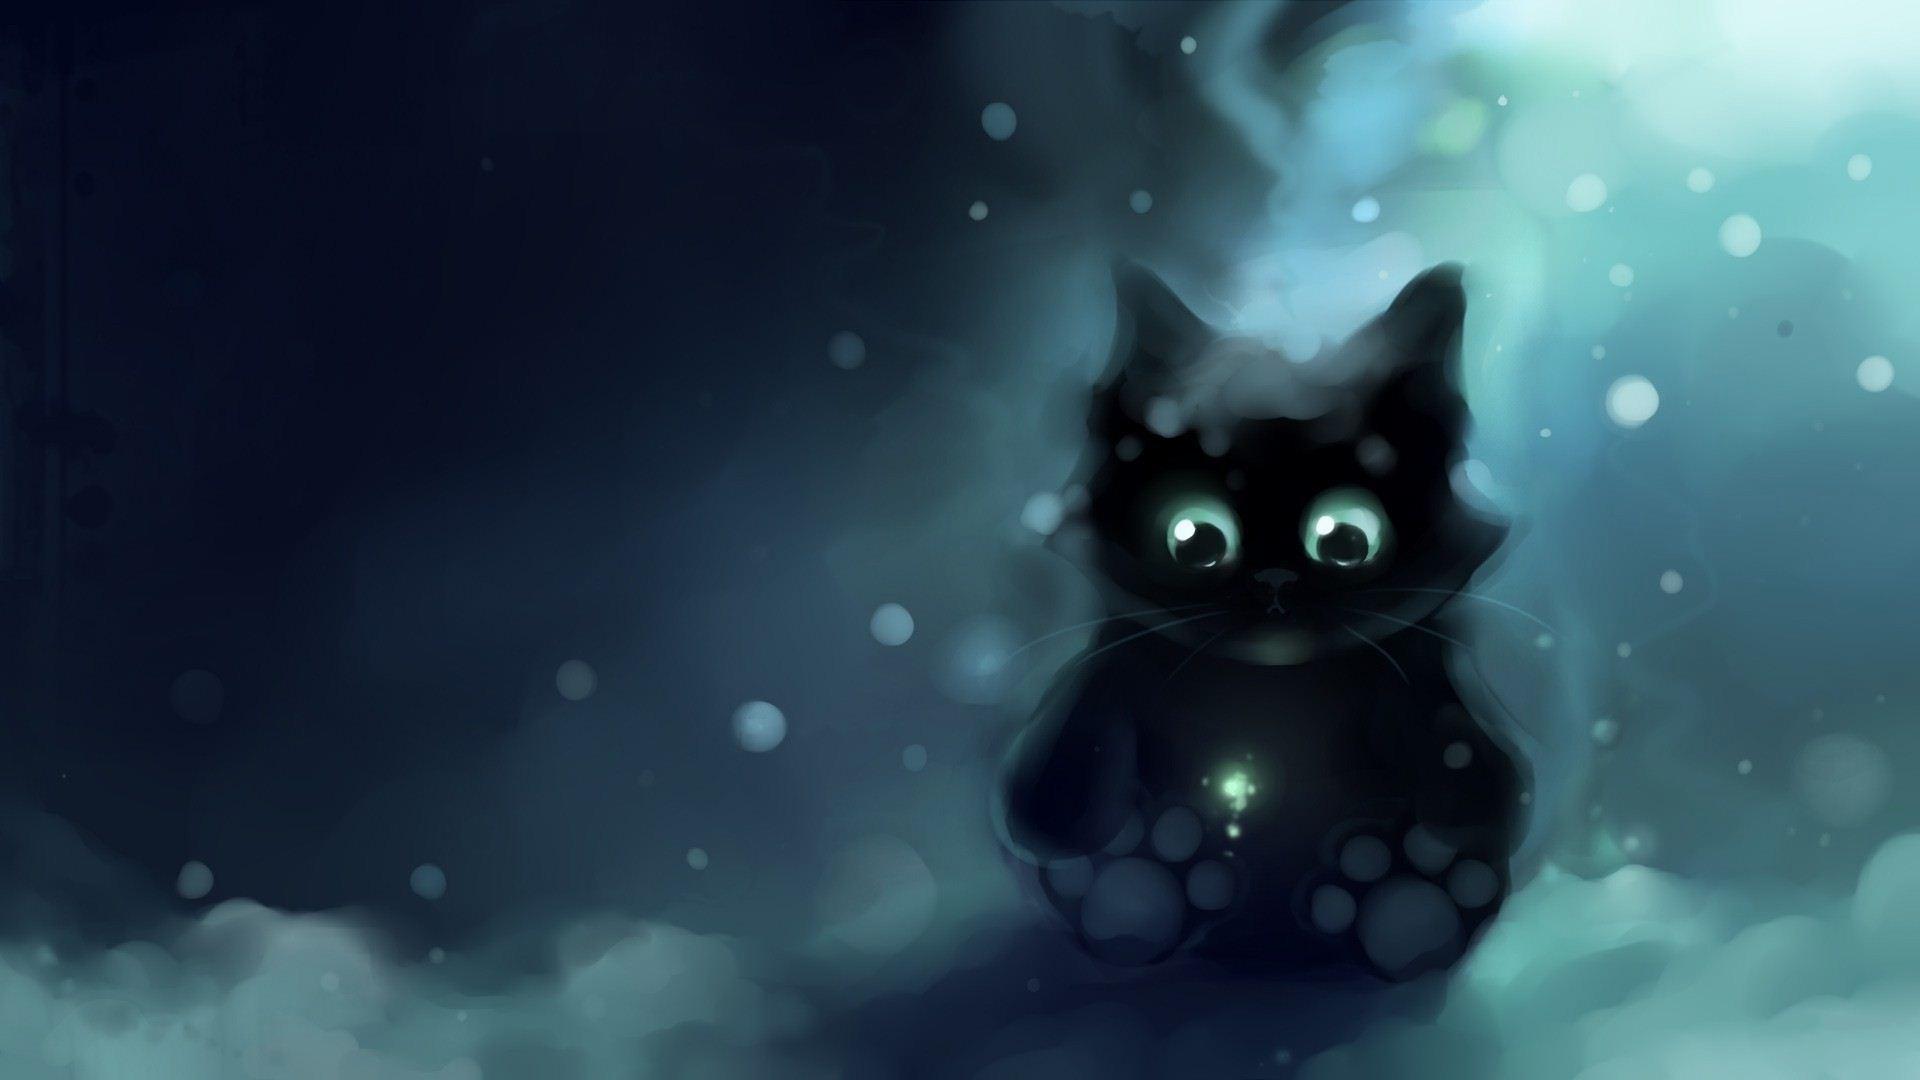 wallpaper.wiki-Anime-Cat-Background-Full-HD-PIC-